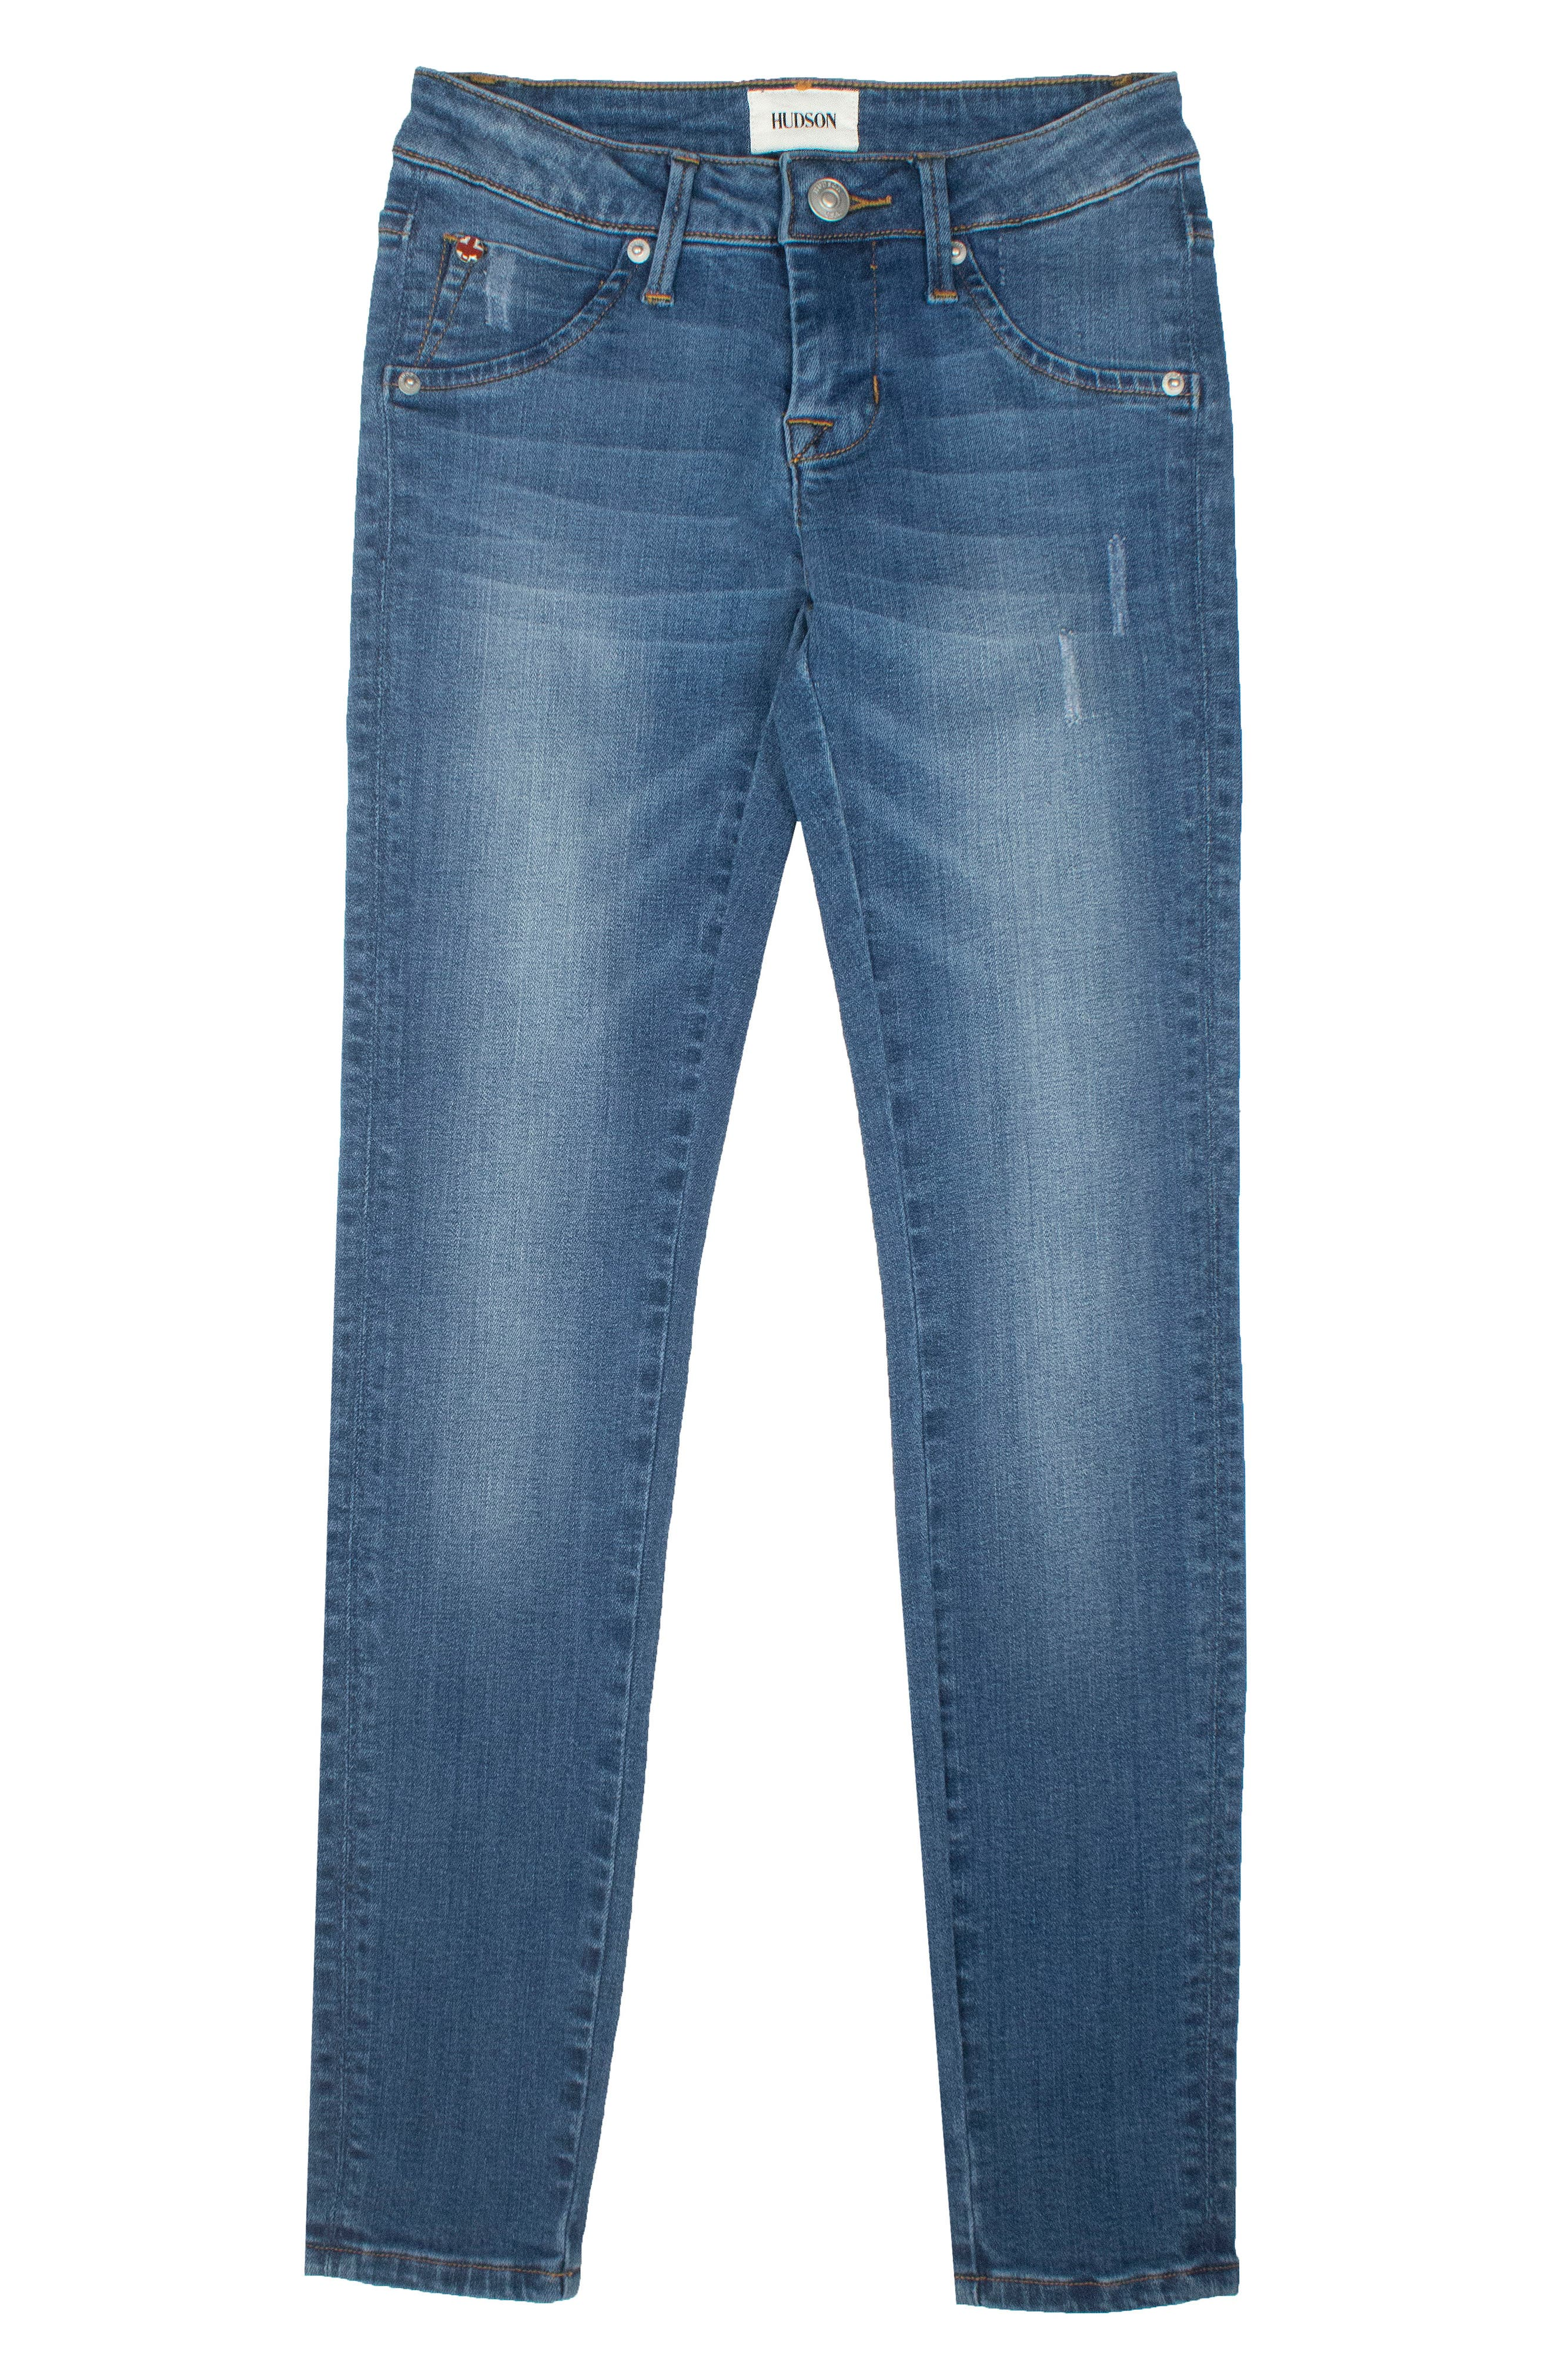 Hudson Kids Christa Flap Pocket Skinny Jeans (Toddler Girls & Little Girls)